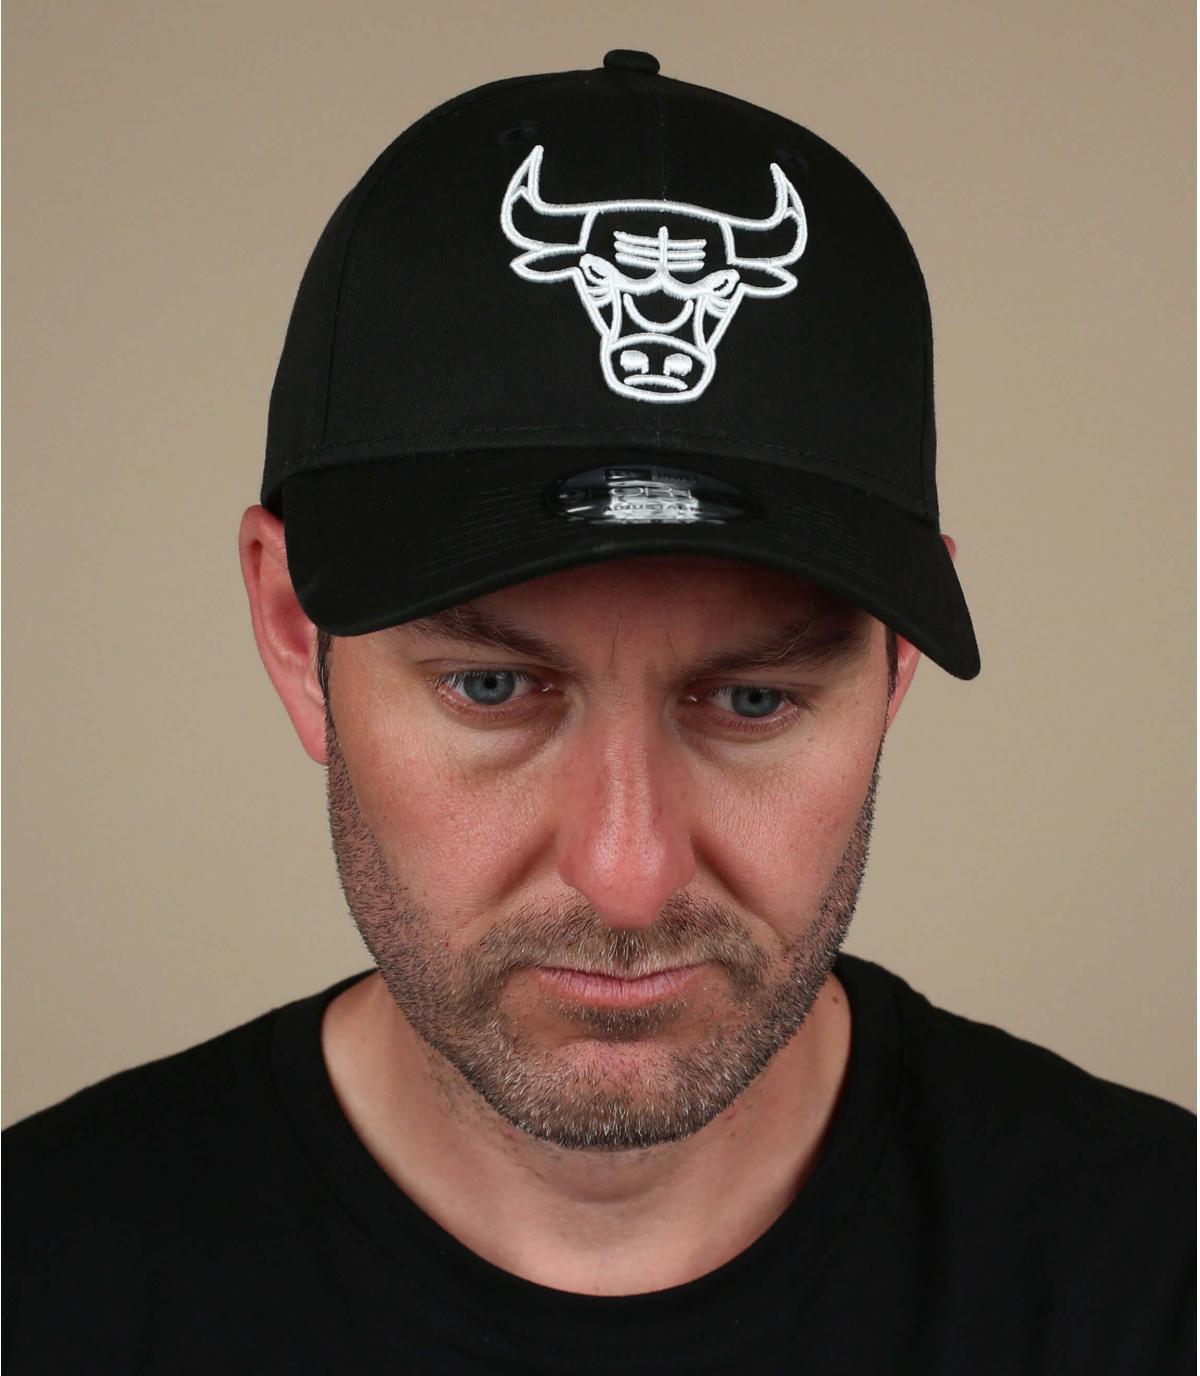 Black white Bulls cap